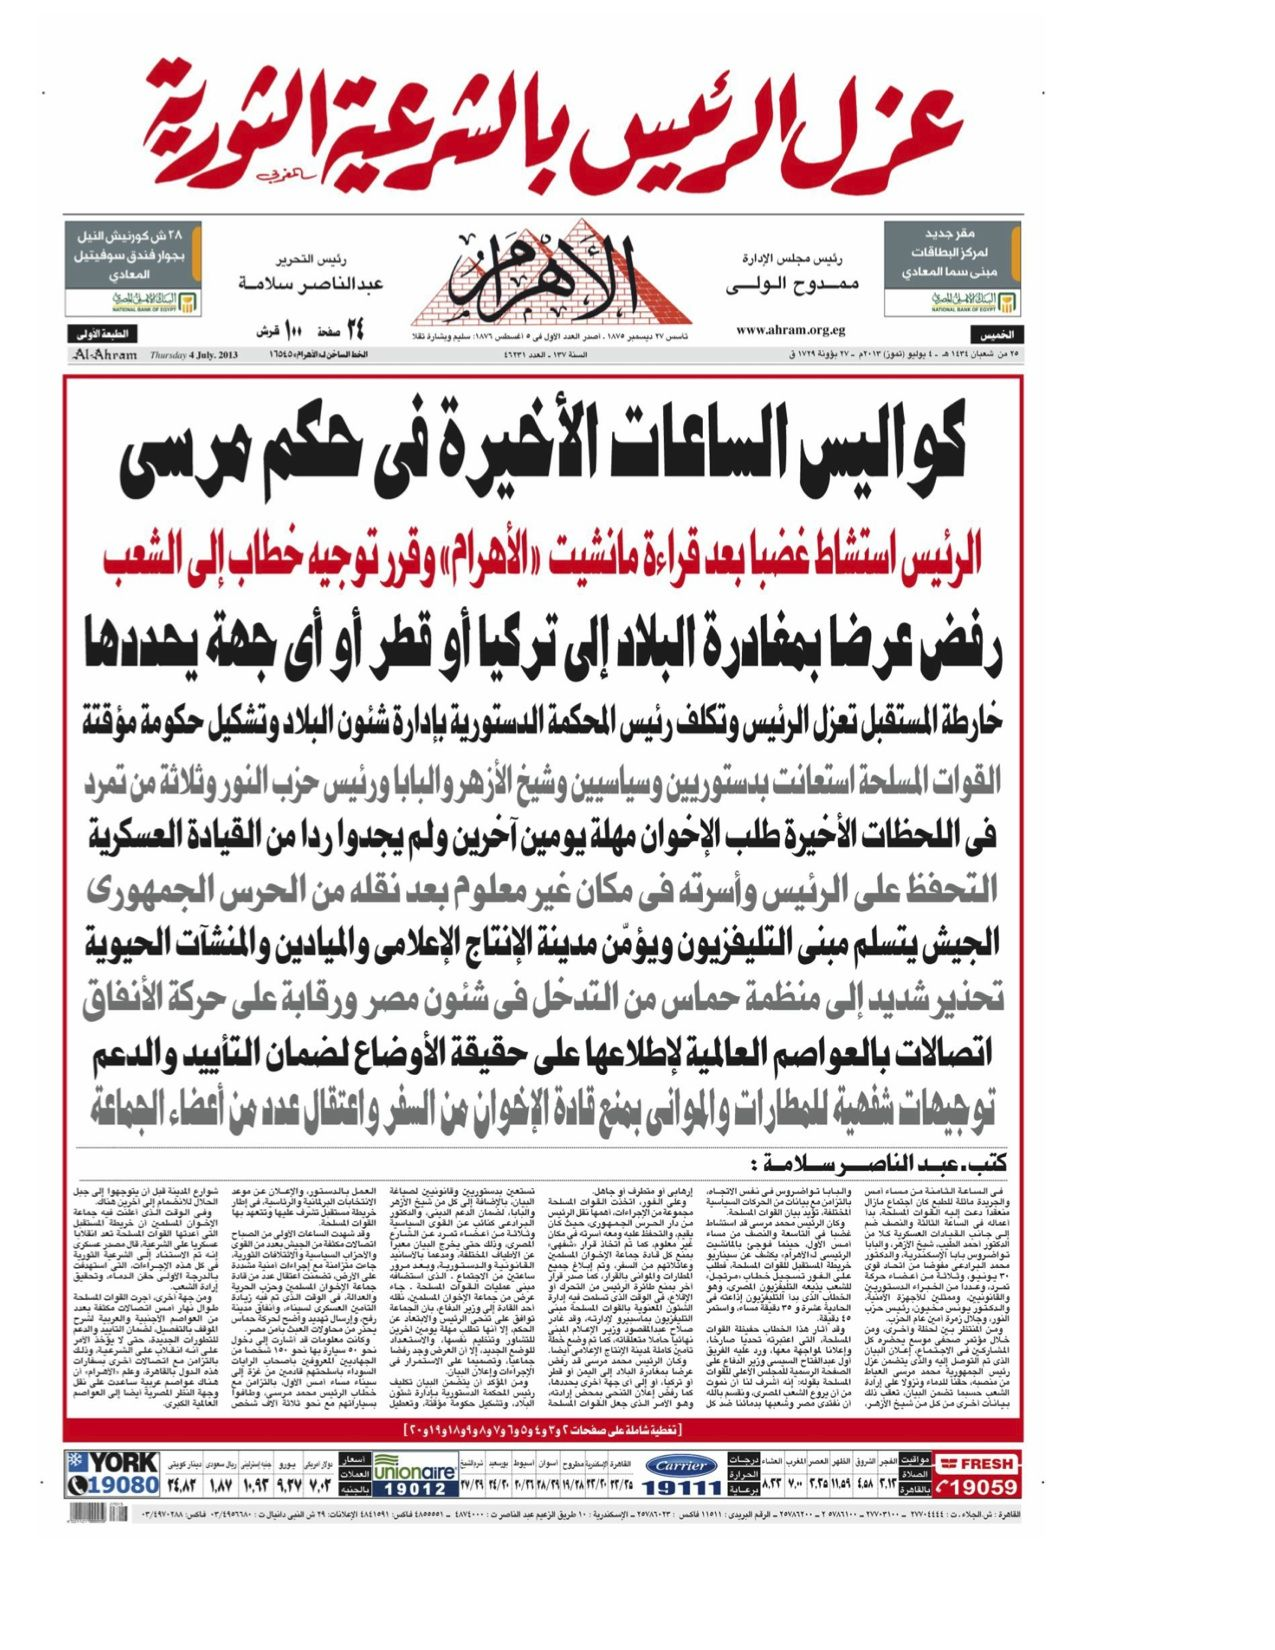 Morsi deposed by revolutionary legitimacy